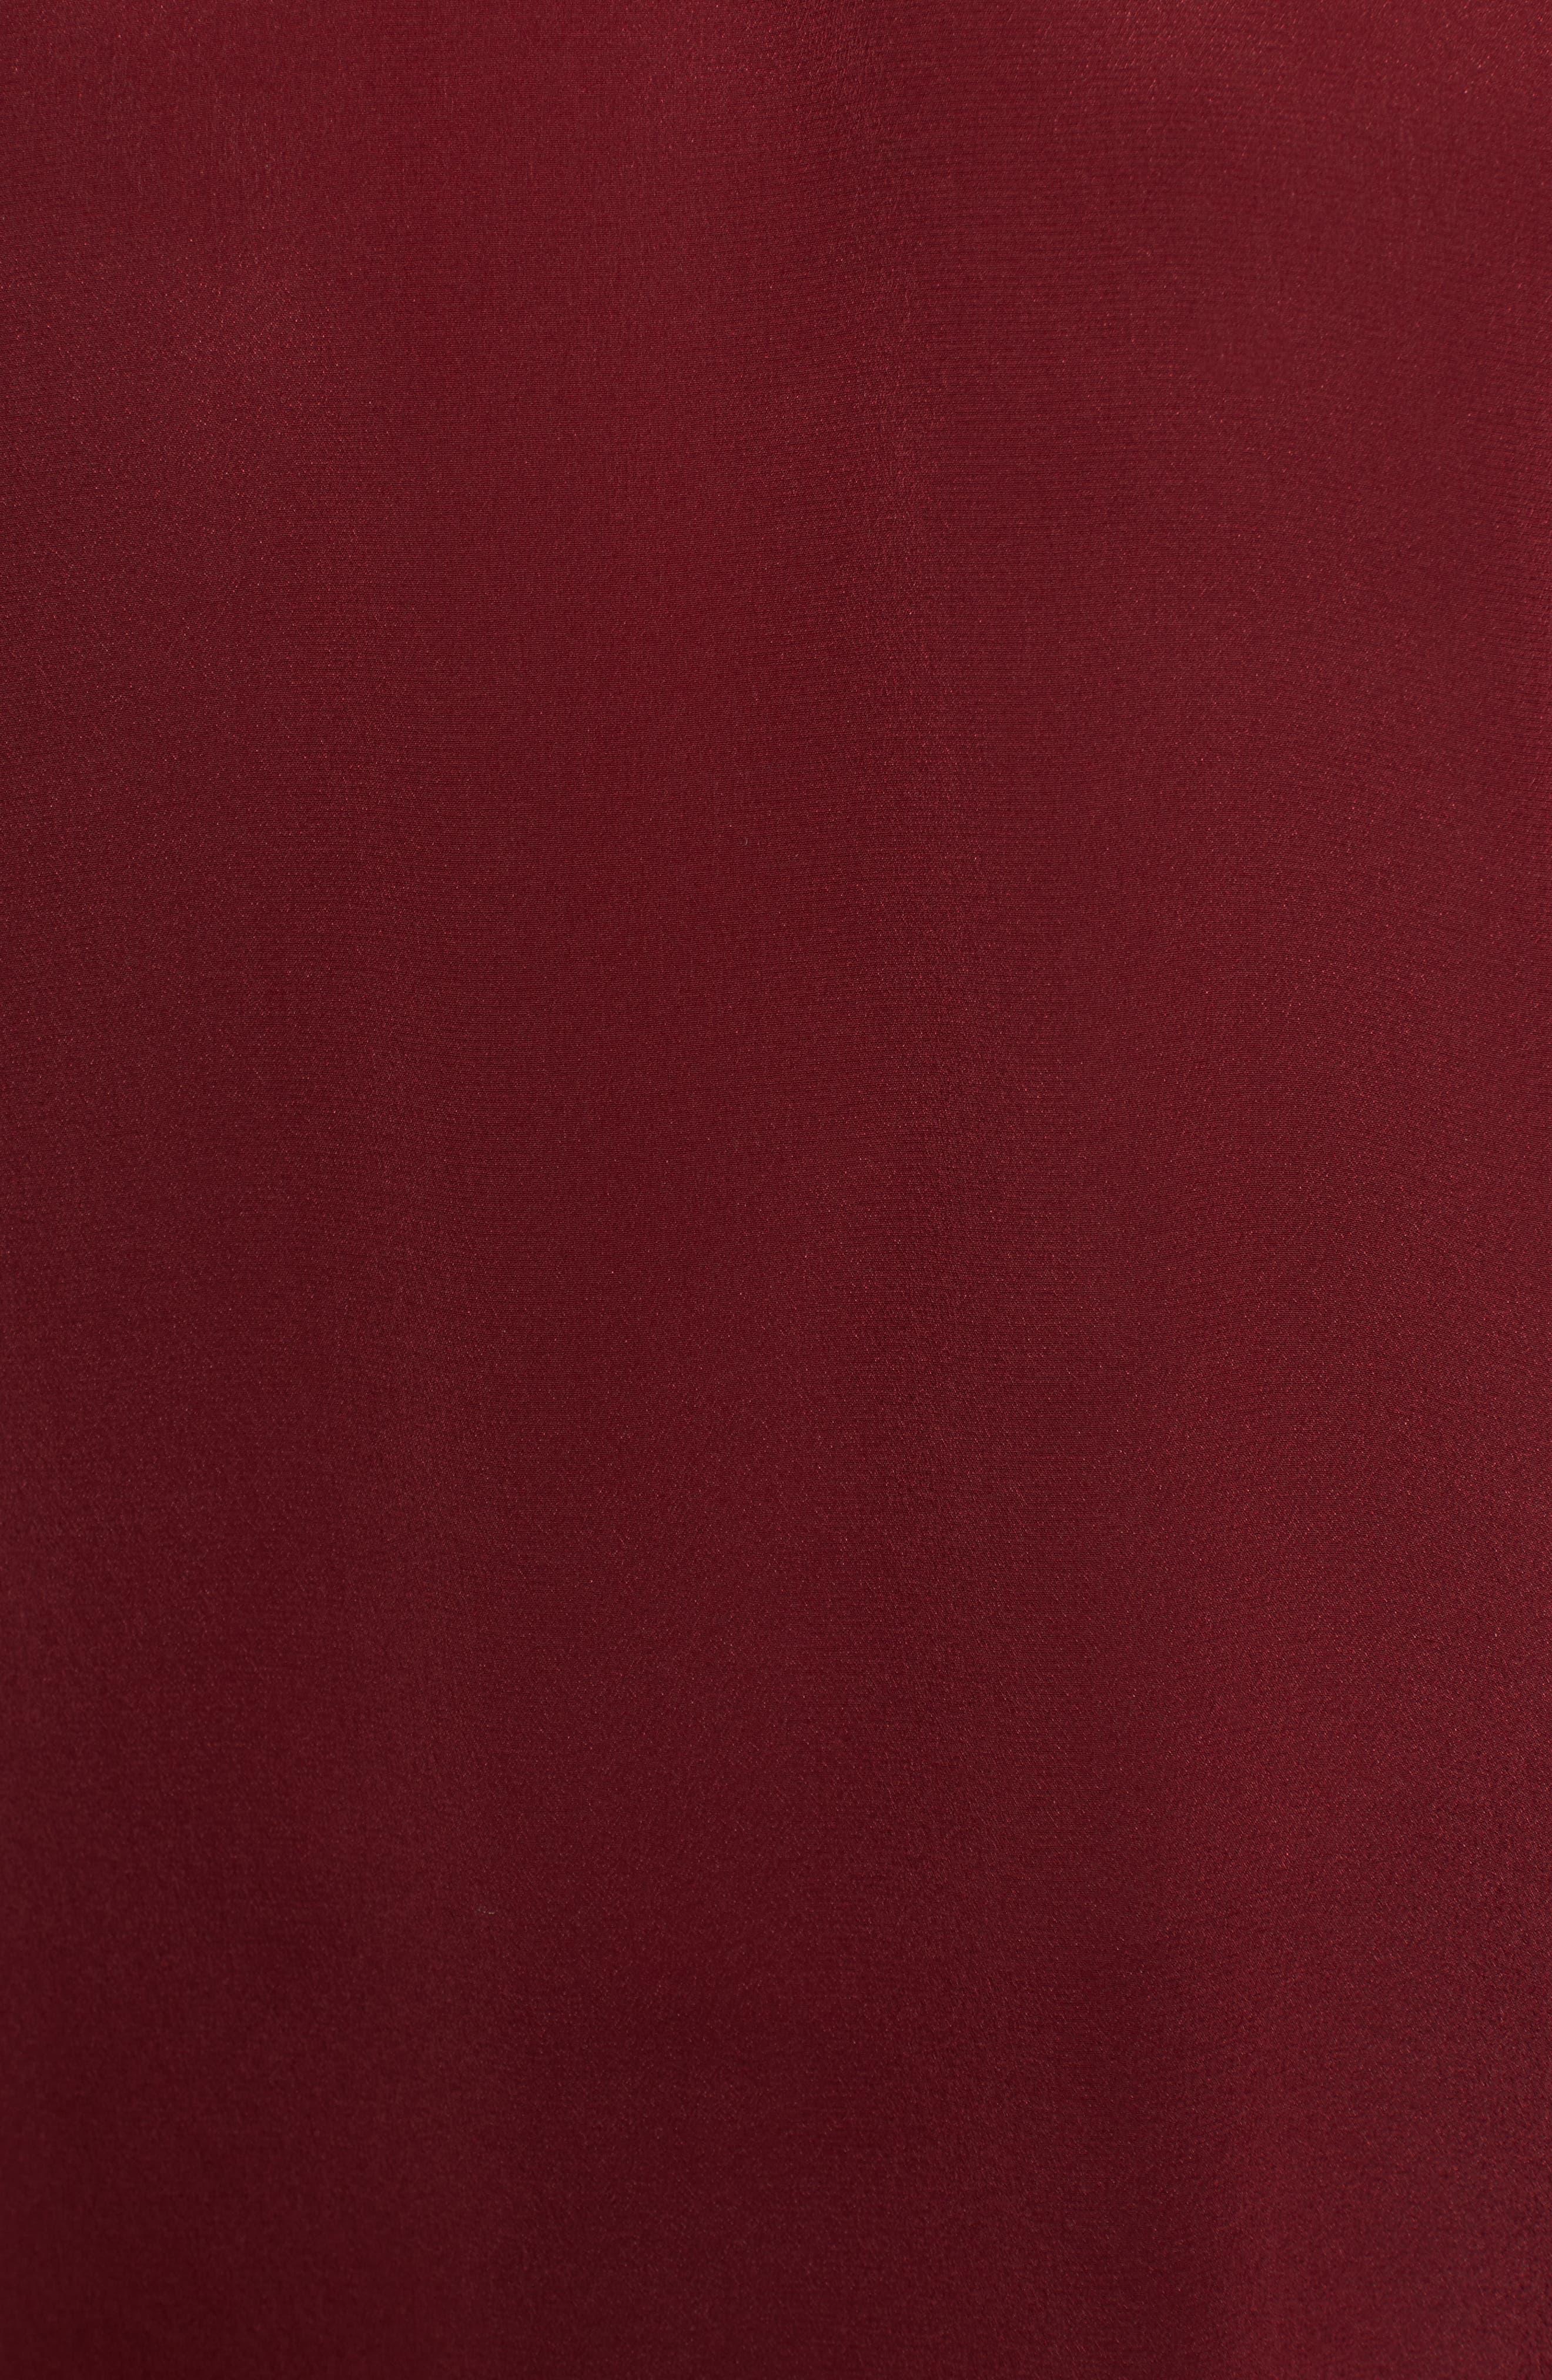 Ruffle Sleeve Silk Top,                             Alternate thumbnail 5, color,